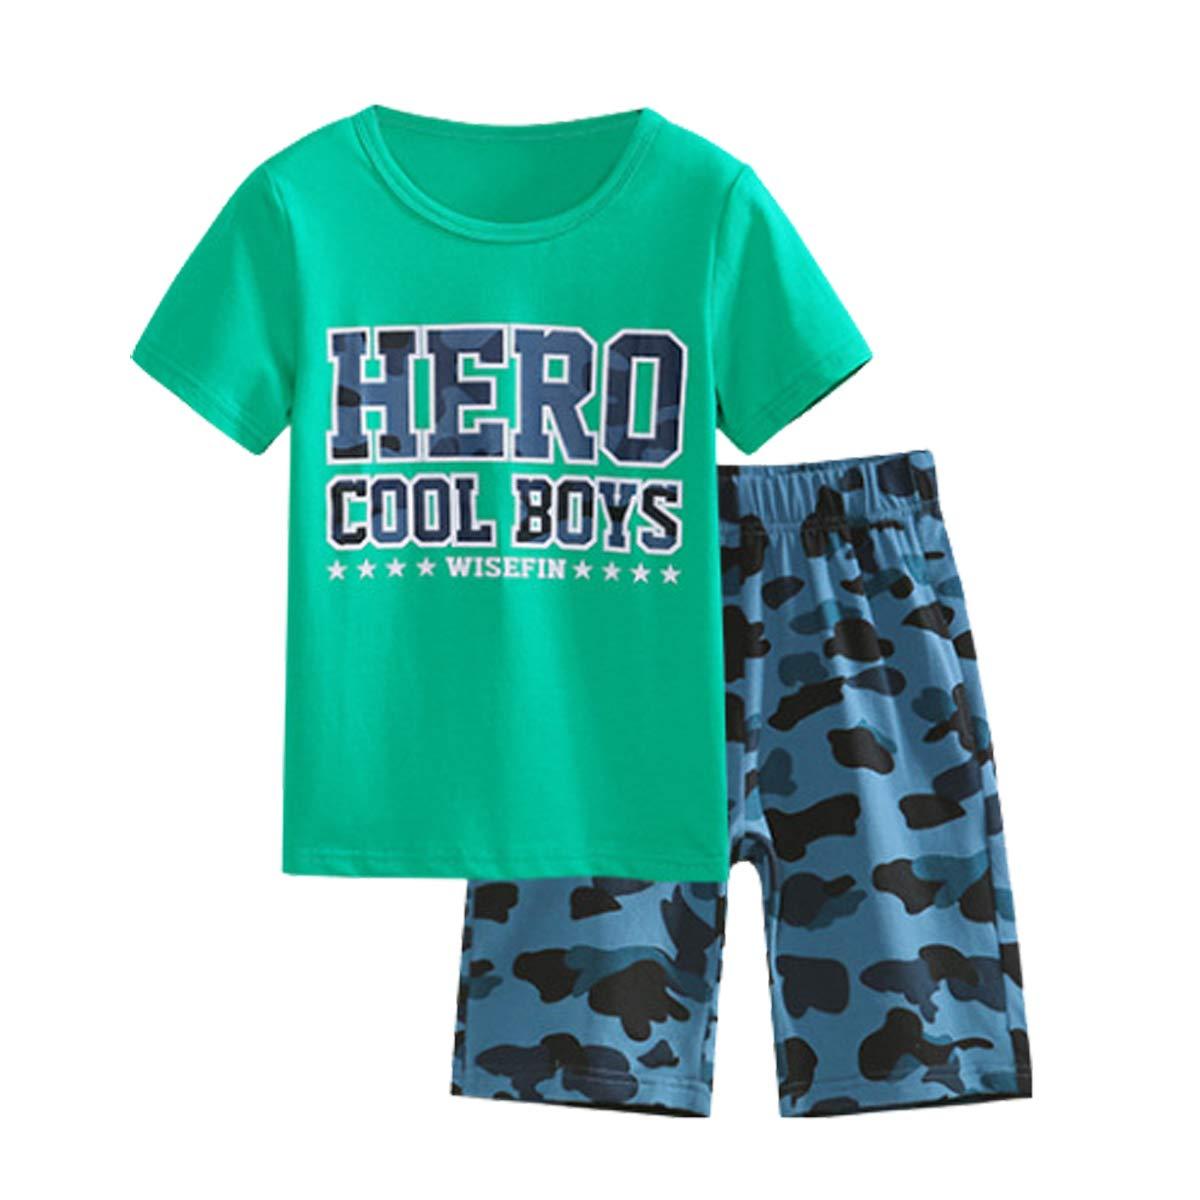 OnlyAngel Boys Cotton Outfits Short Sleeve Tee /& Blue Elastic Waistband Shorts Set Age 4-13